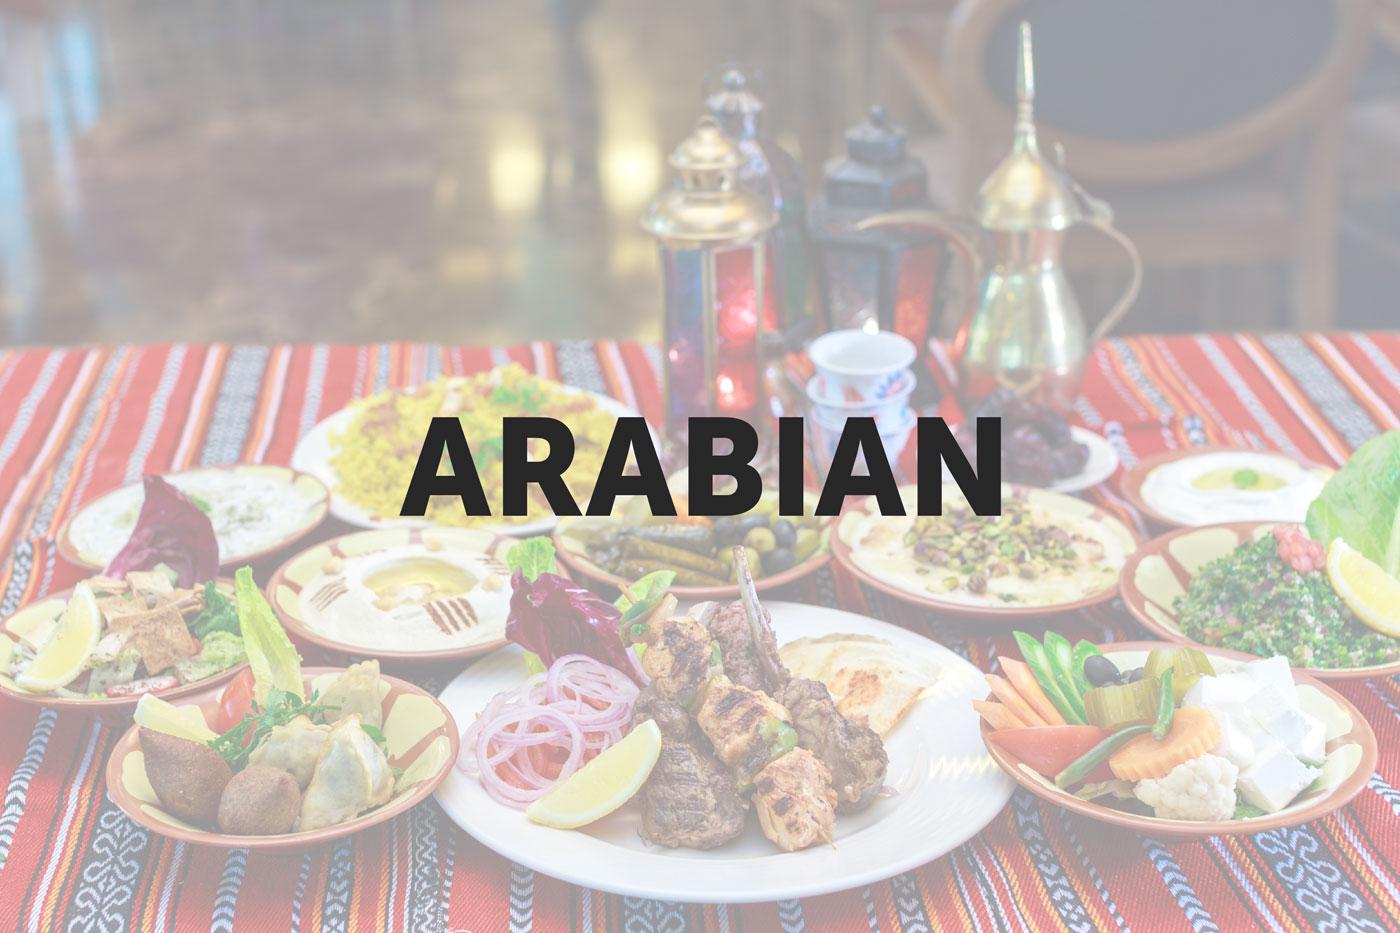 Arabian--Buffet-at-Great-British-Restaurant